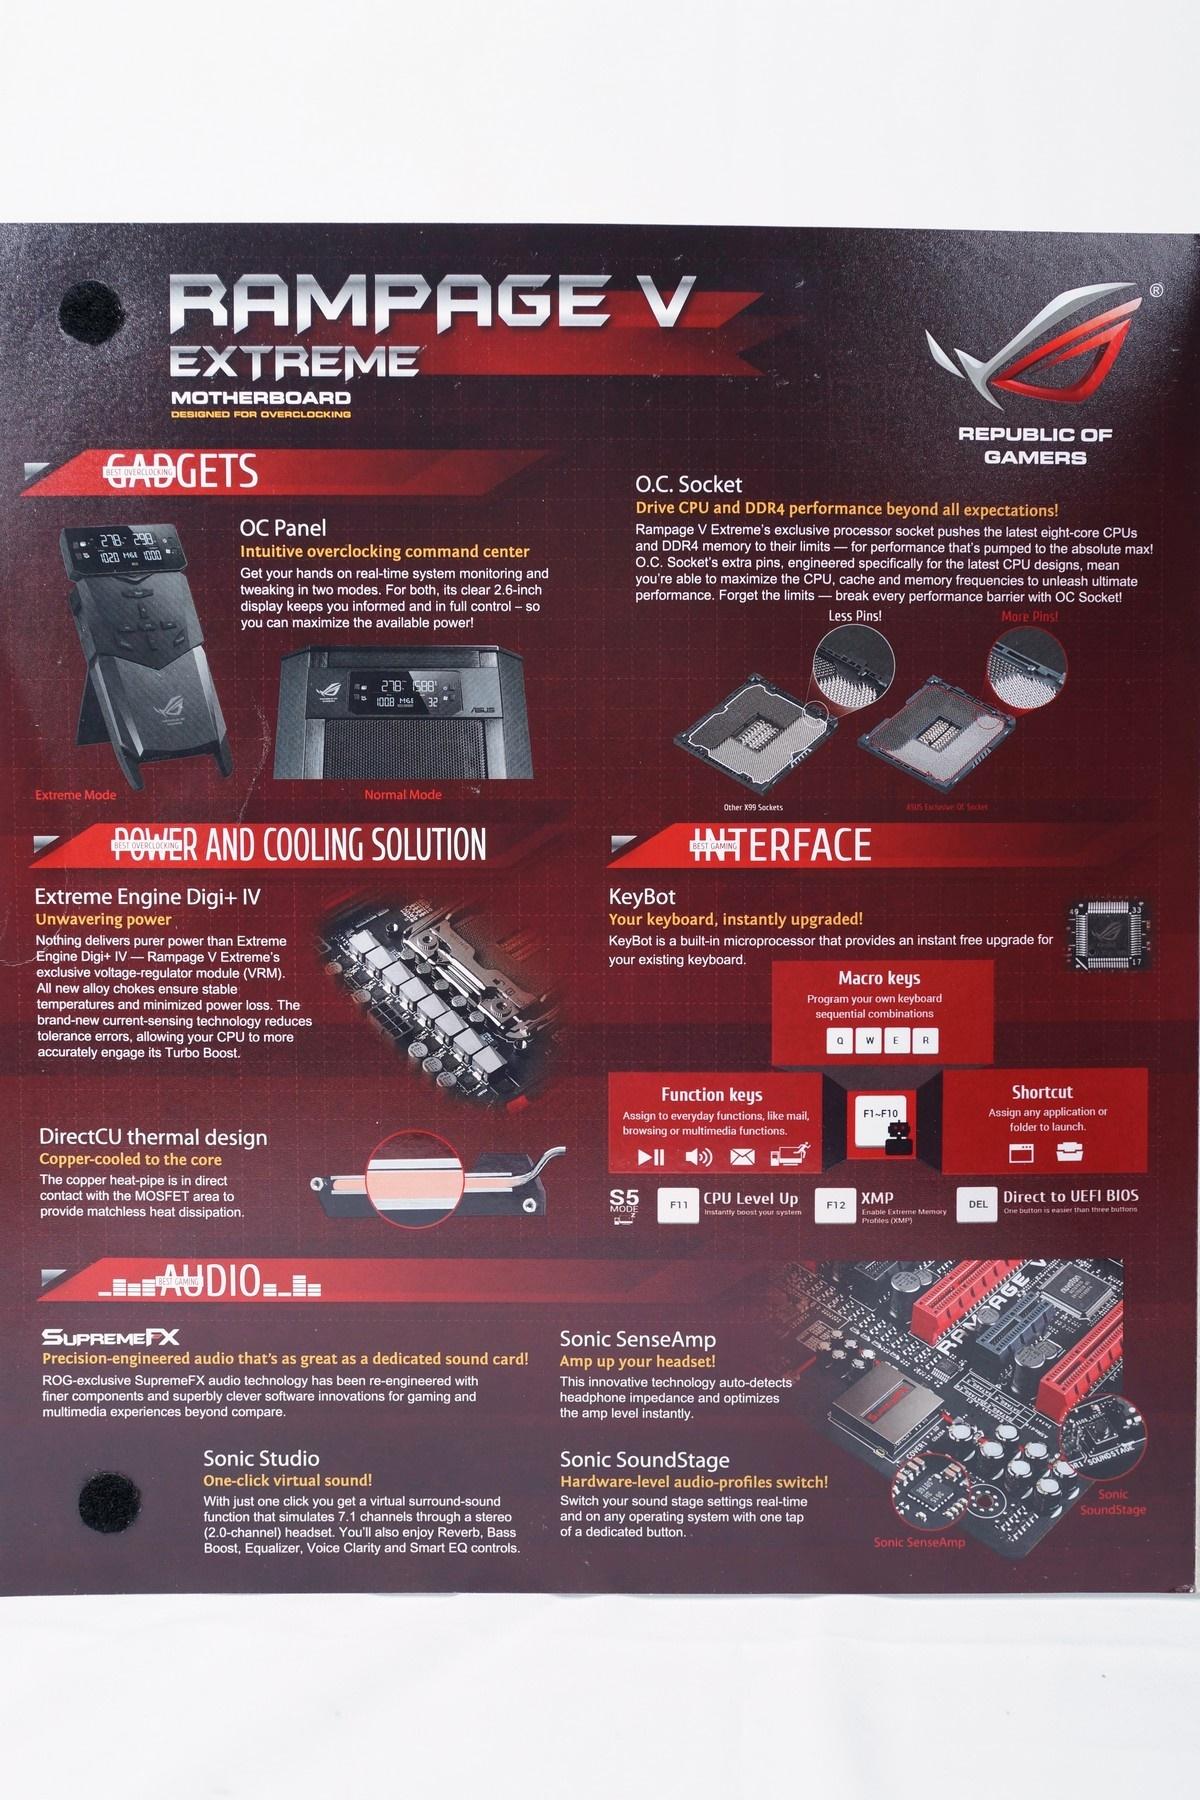 [XF] 睥睨群雄王者風采 再創平台能效巔峰 ASUS ROG Rampage V Extreme 評測